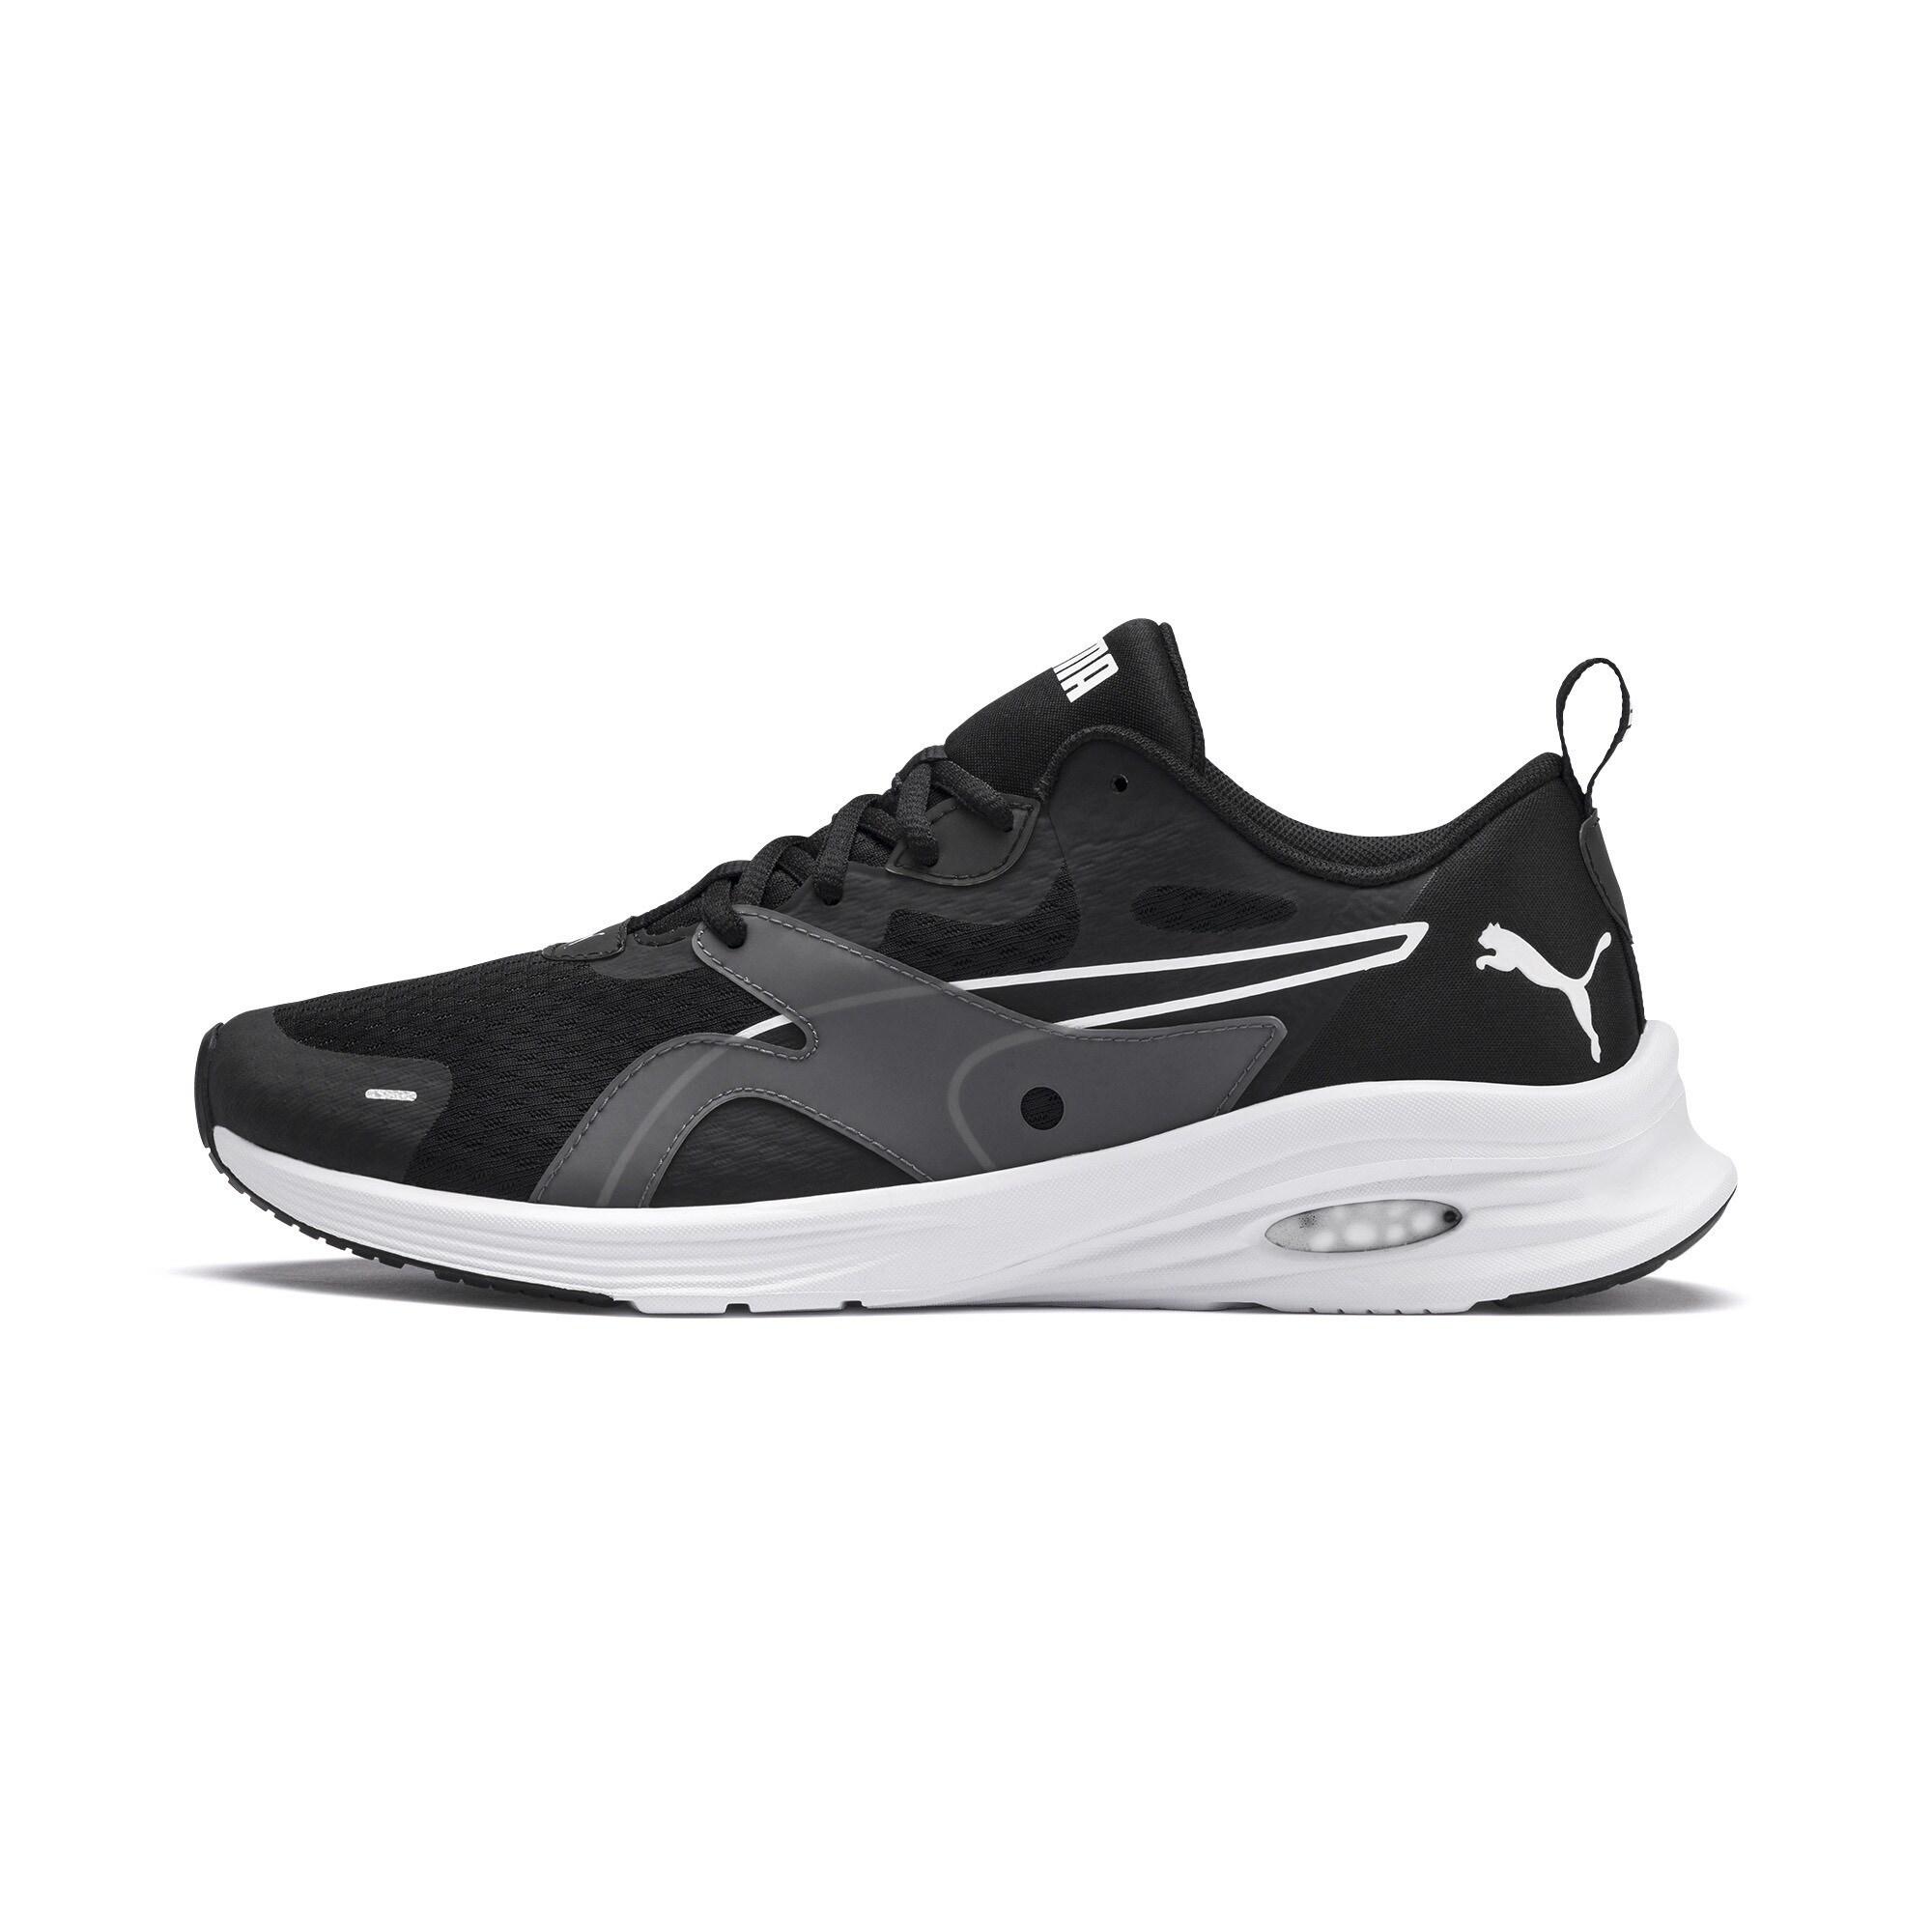 Běžecká obuv Fuego černá bílá PUMA